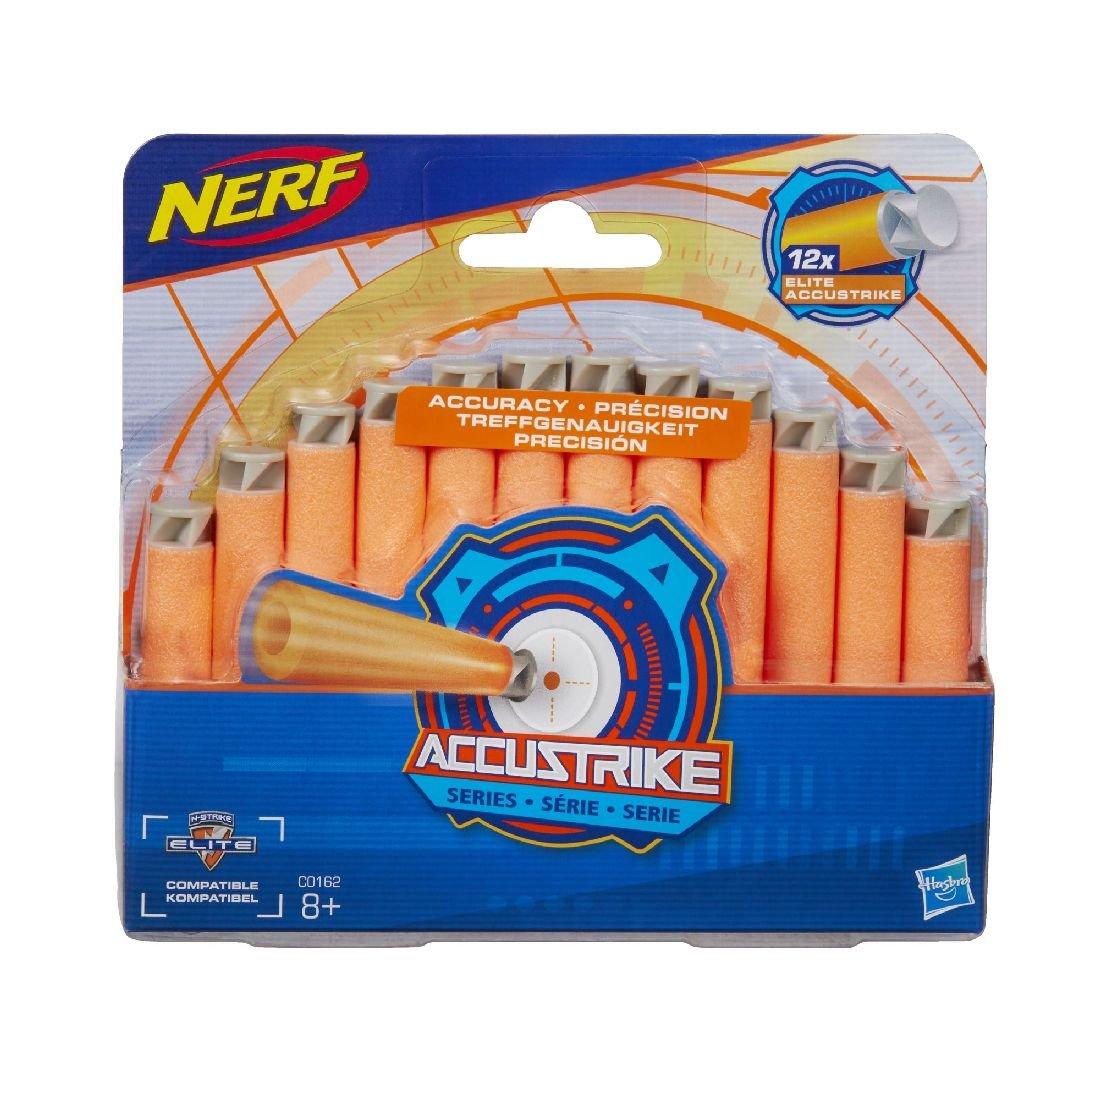 Nerf strzałki AccuStrike 12 sztuk